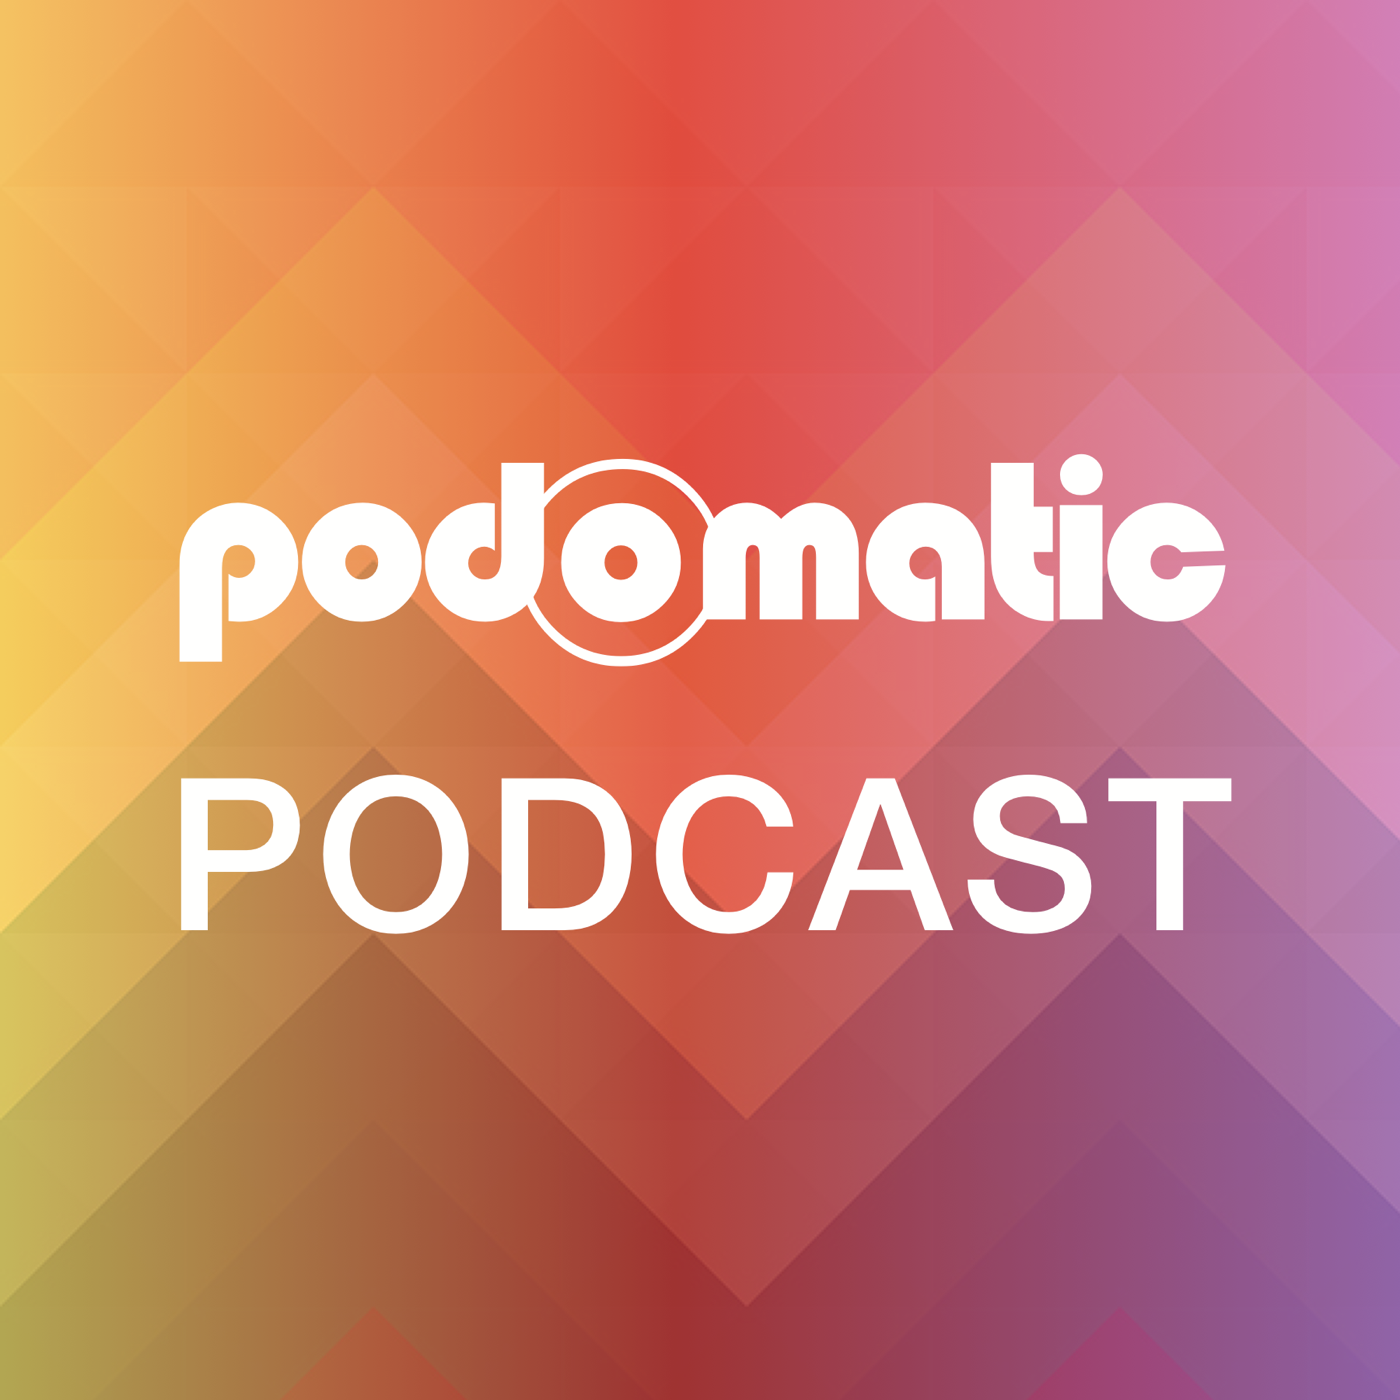 Matteo Pasculli's Podcast